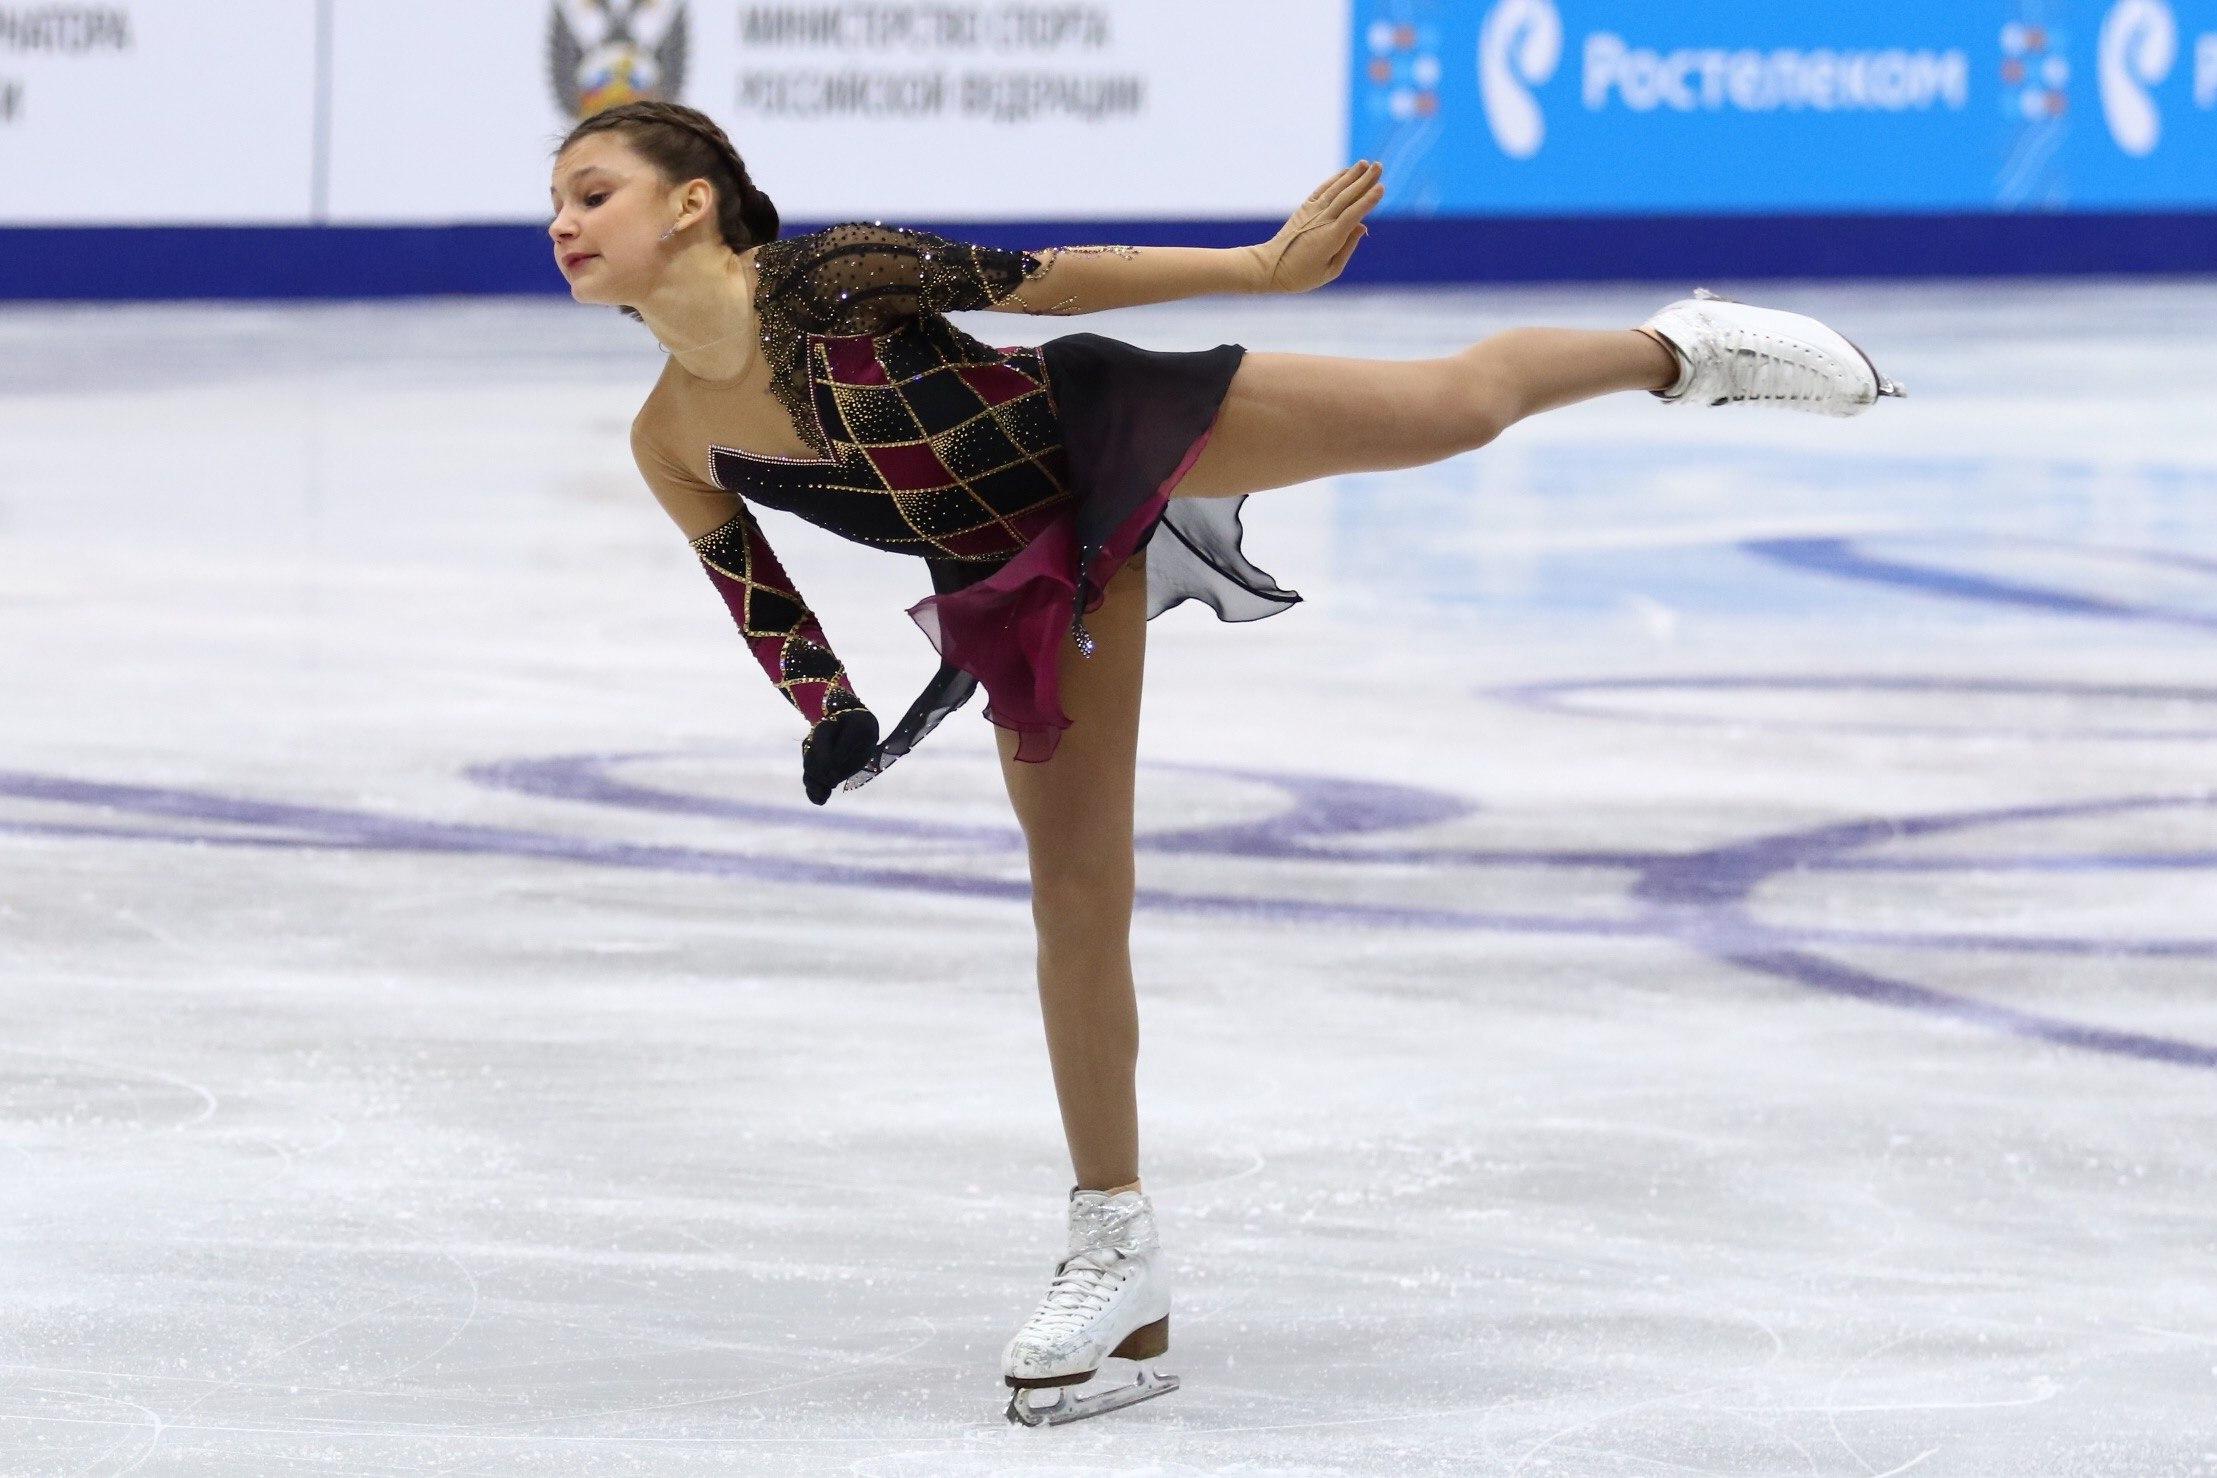 Софья Самодурова (26.12.2016)